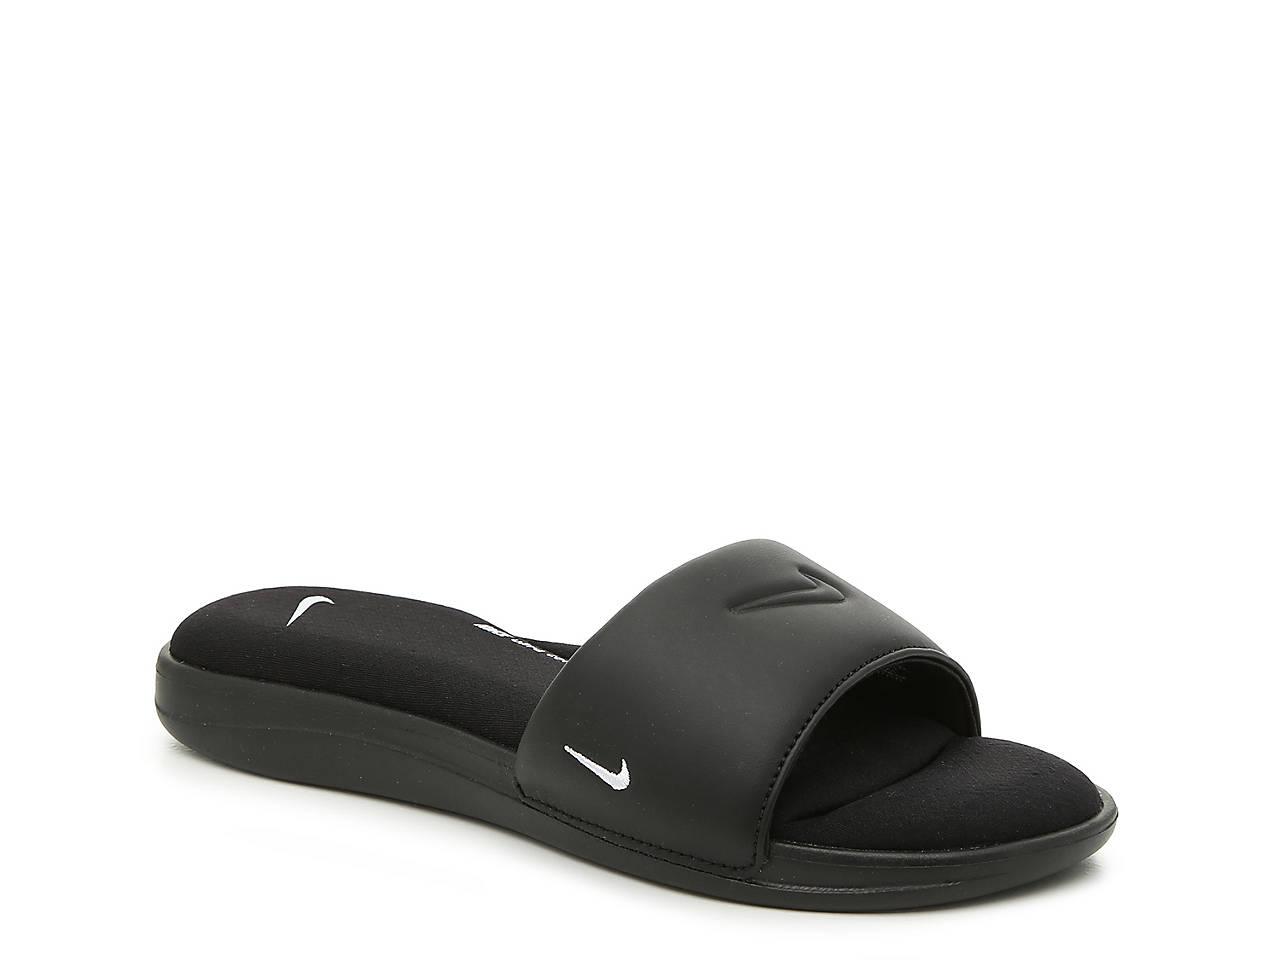 low priced 64c56 fada9 Nike. Ultra Comfort 3 Slide Sandal - Women s